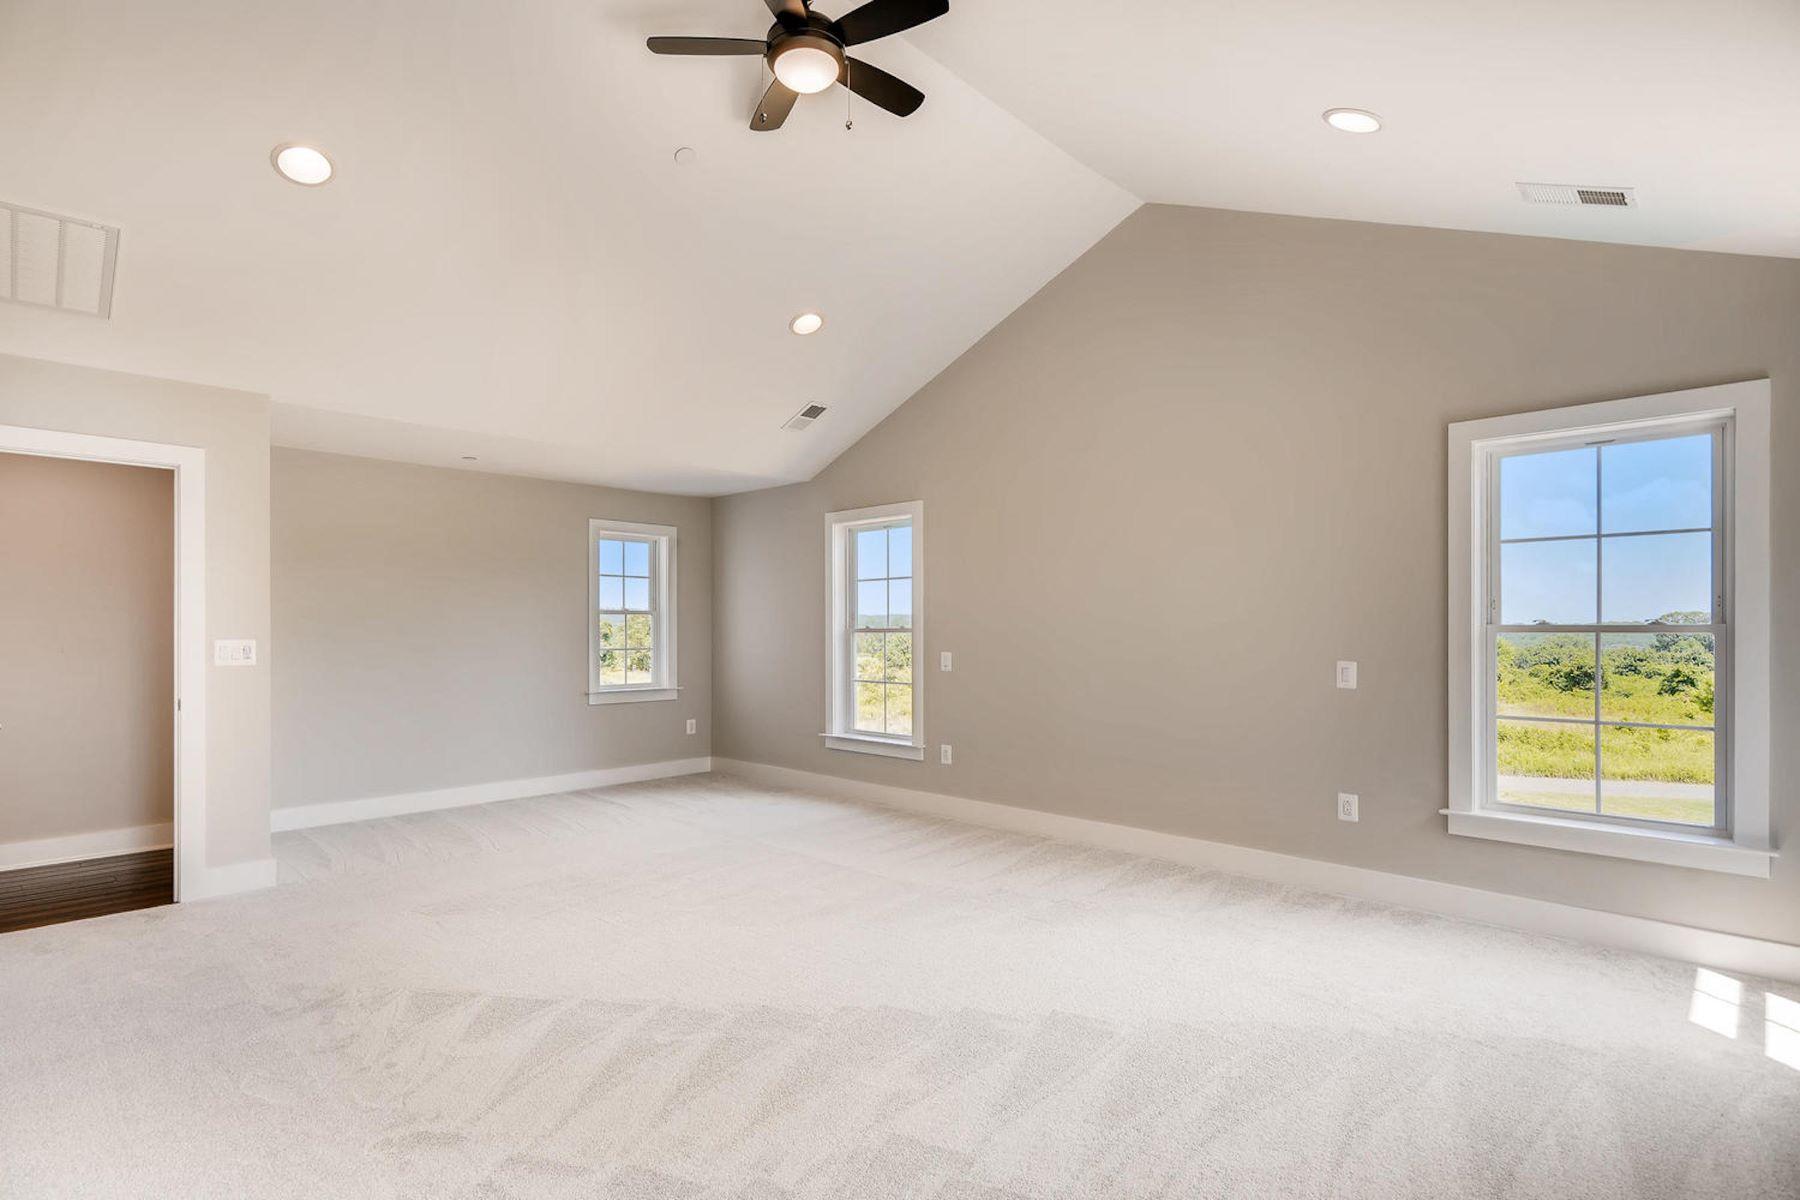 Additional photo for property listing at Ayres Property 2809 12 Stones Road, Bel Air, Maryland 21015 Amerika Birleşik Devletleri